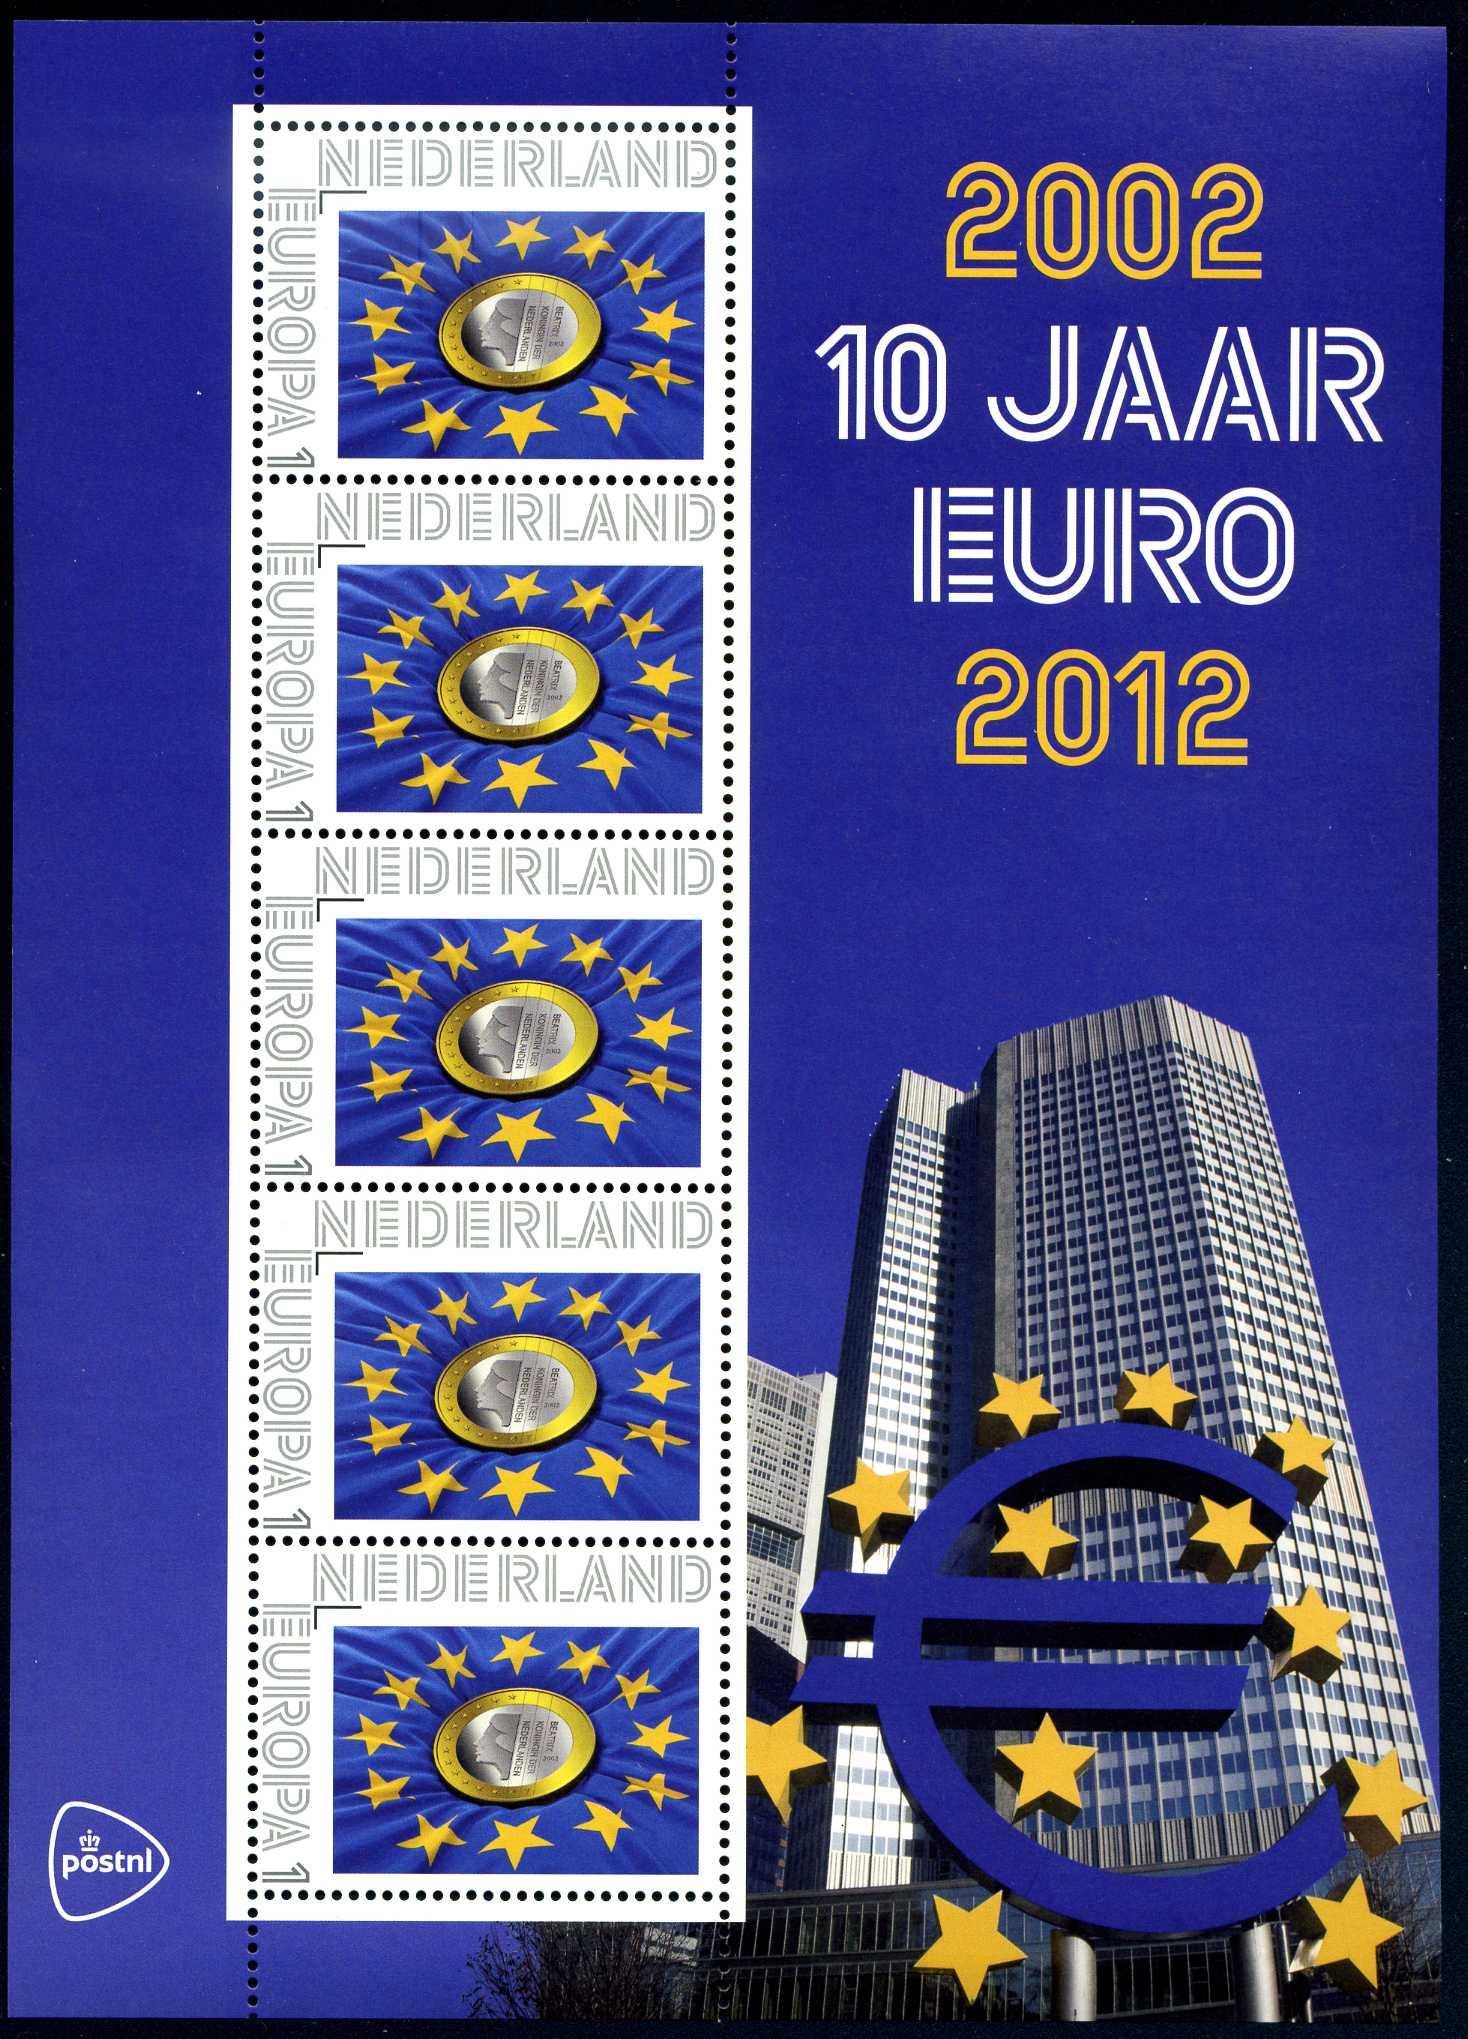 NL 115 2012 10YEC.jpg